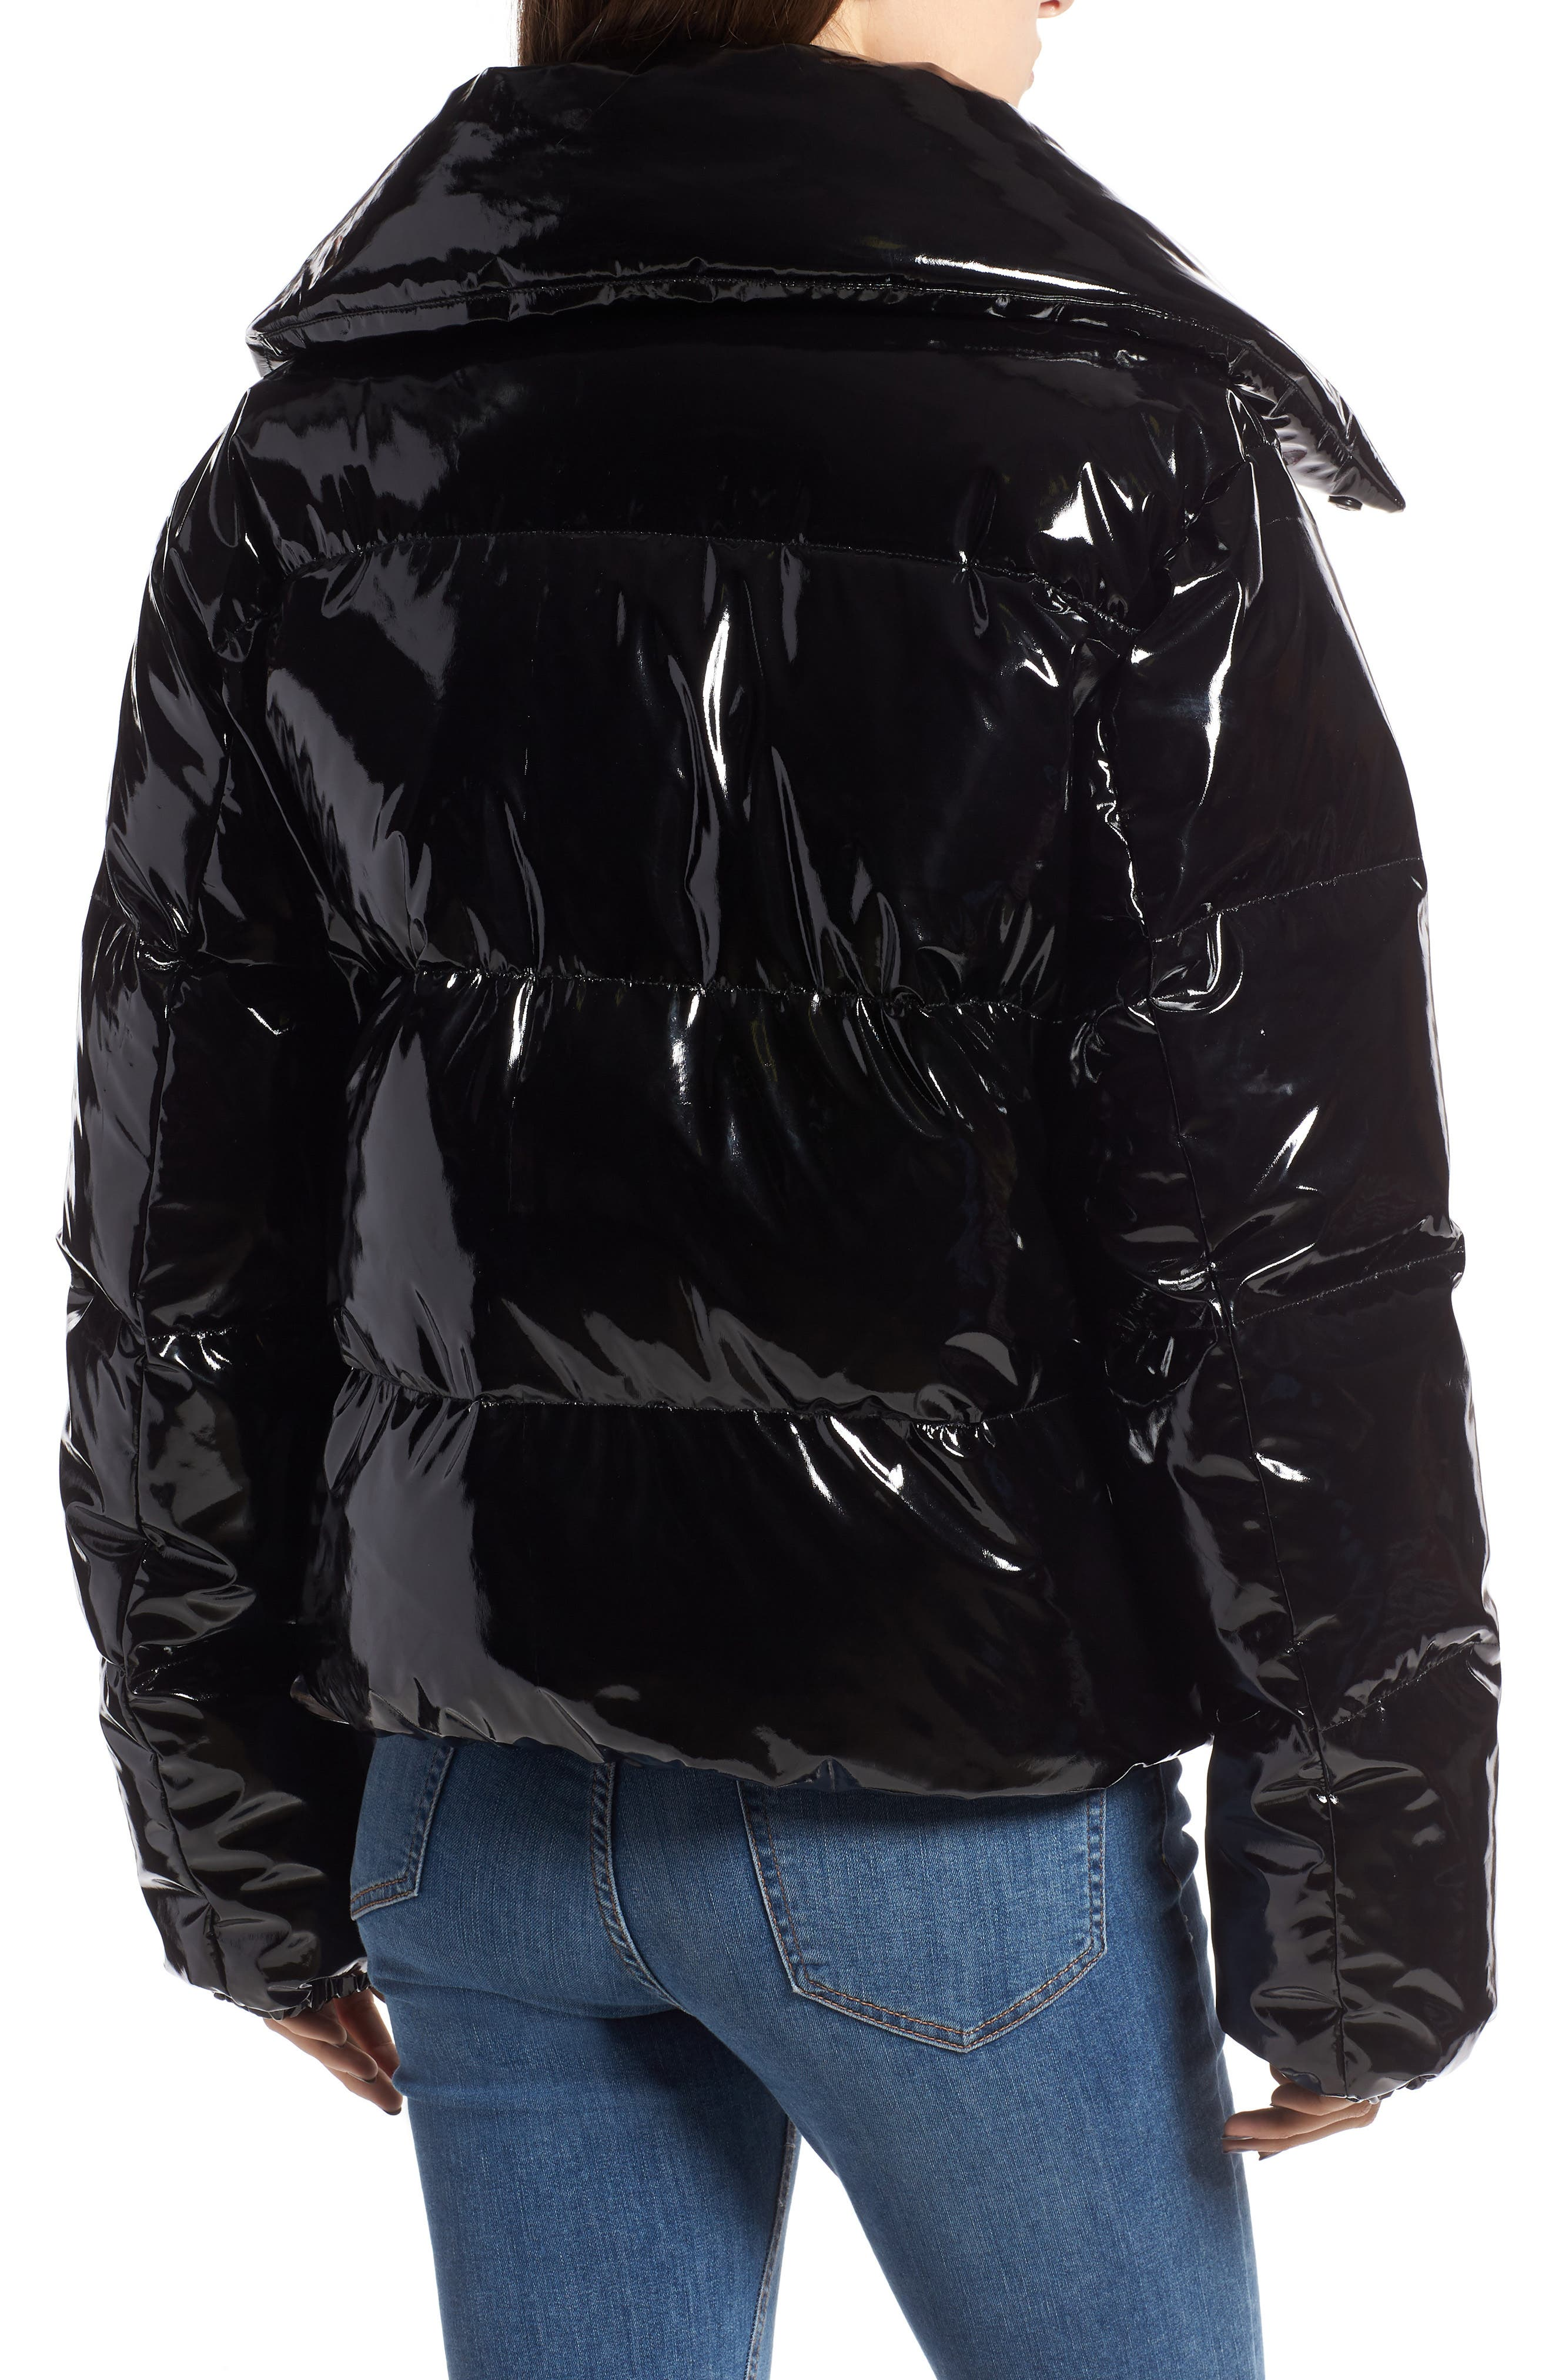 KENDALL + KYLIE, Vinyl Puffer Jacket, Alternate thumbnail 2, color, BLACK